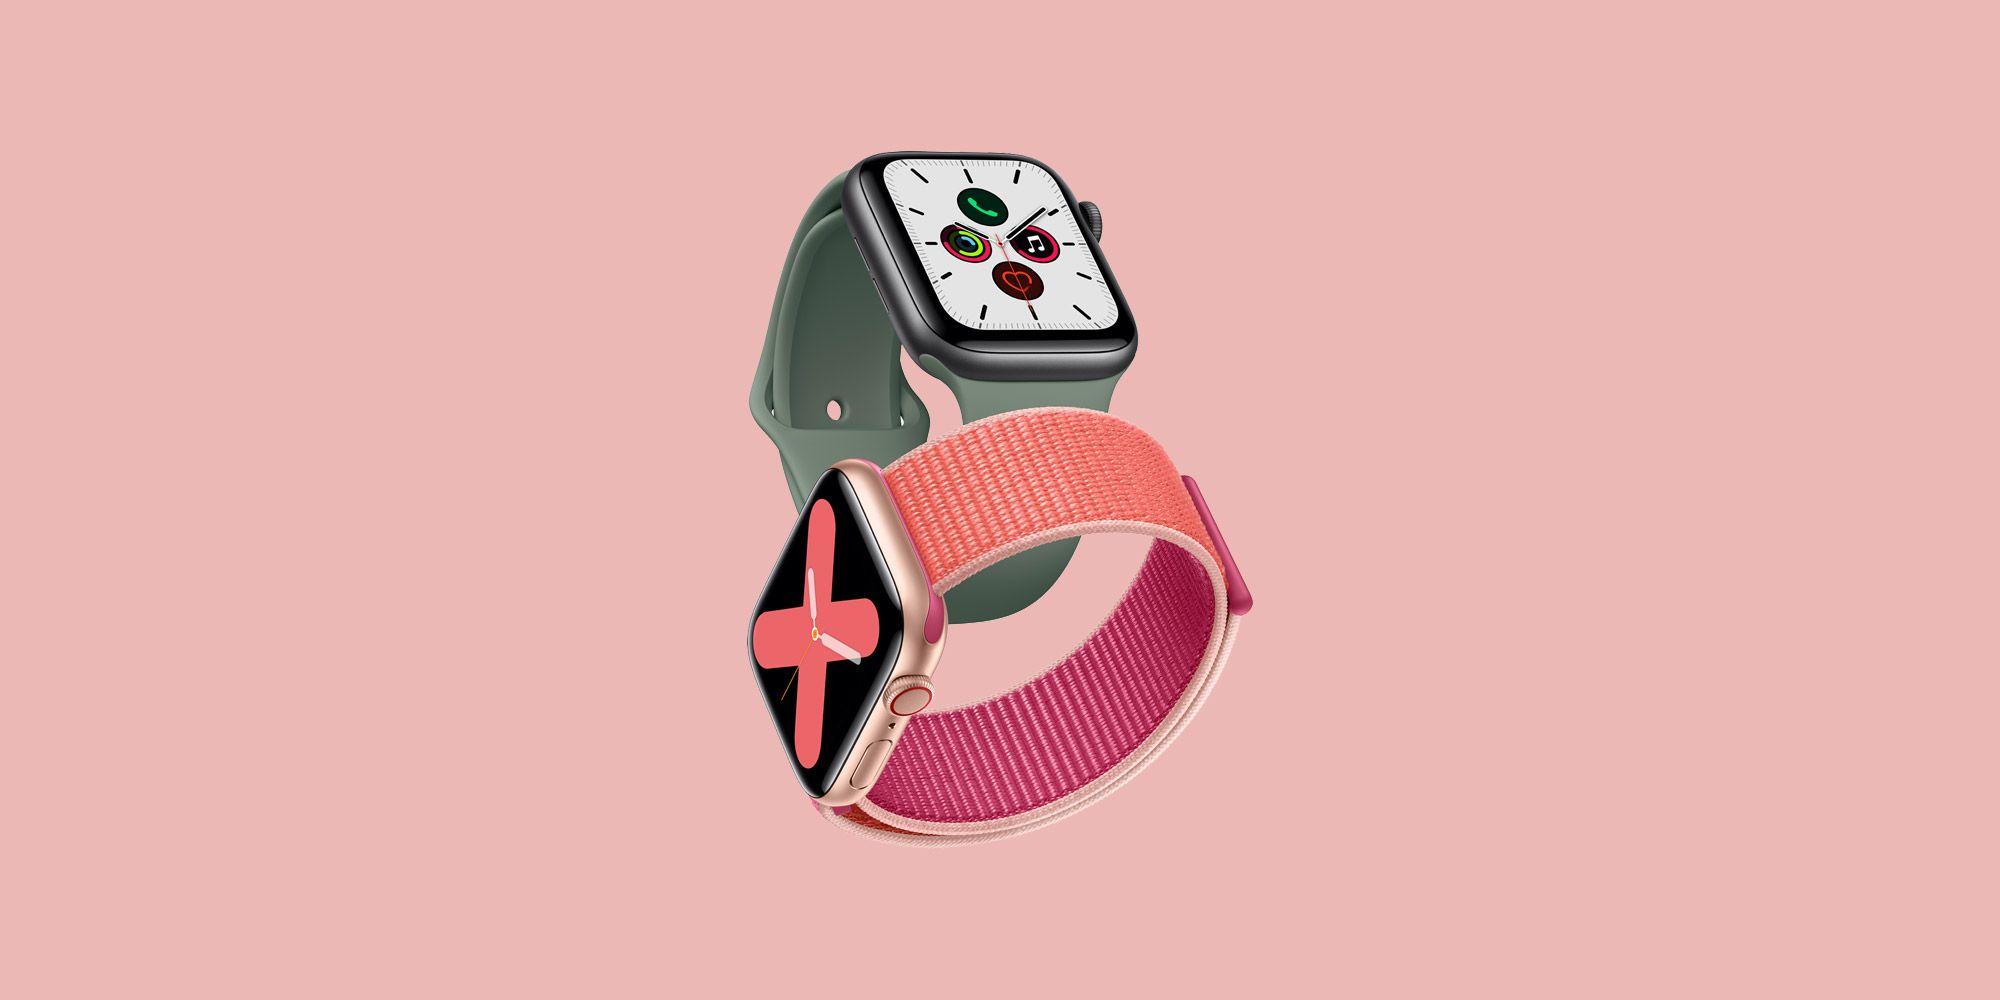 Apple Watch Series 5: Should you buy Apple's latest smart watch?